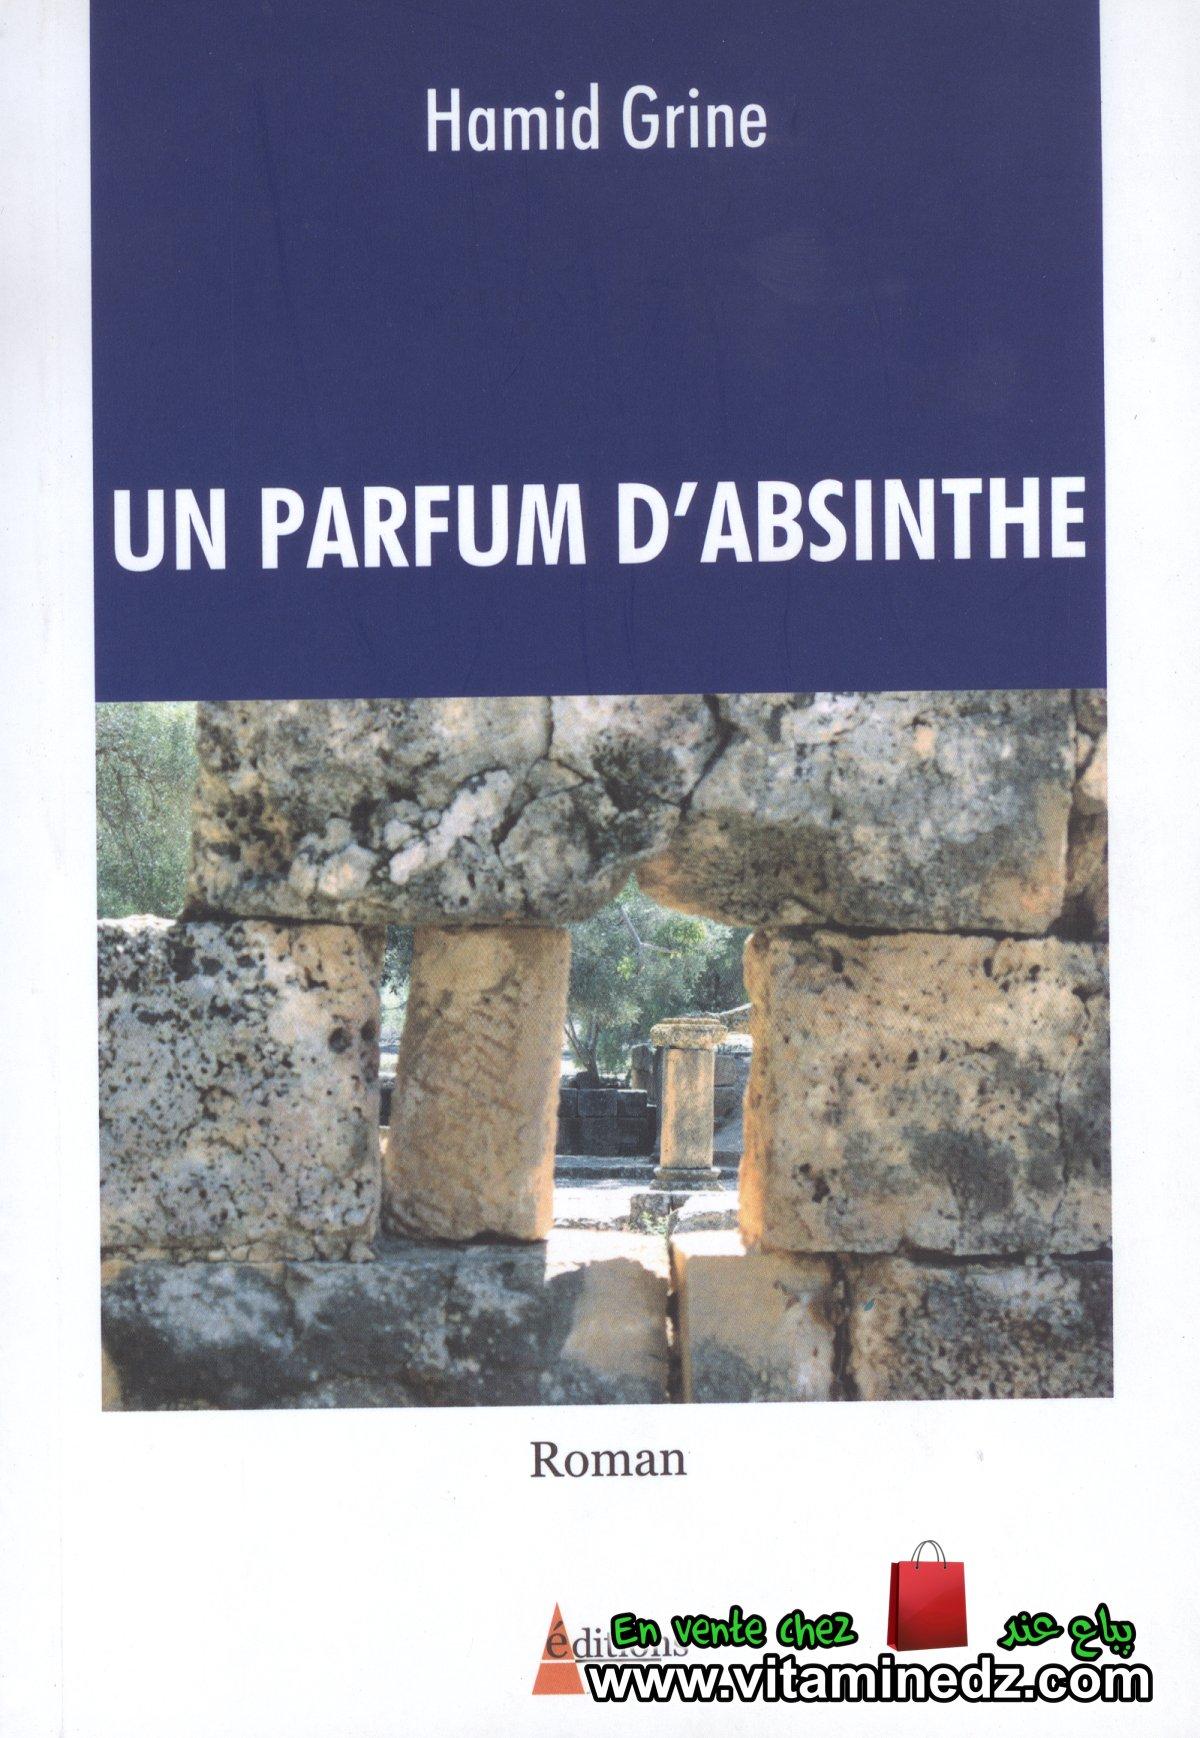 Hamid Grine - Un parfum d'absinthe